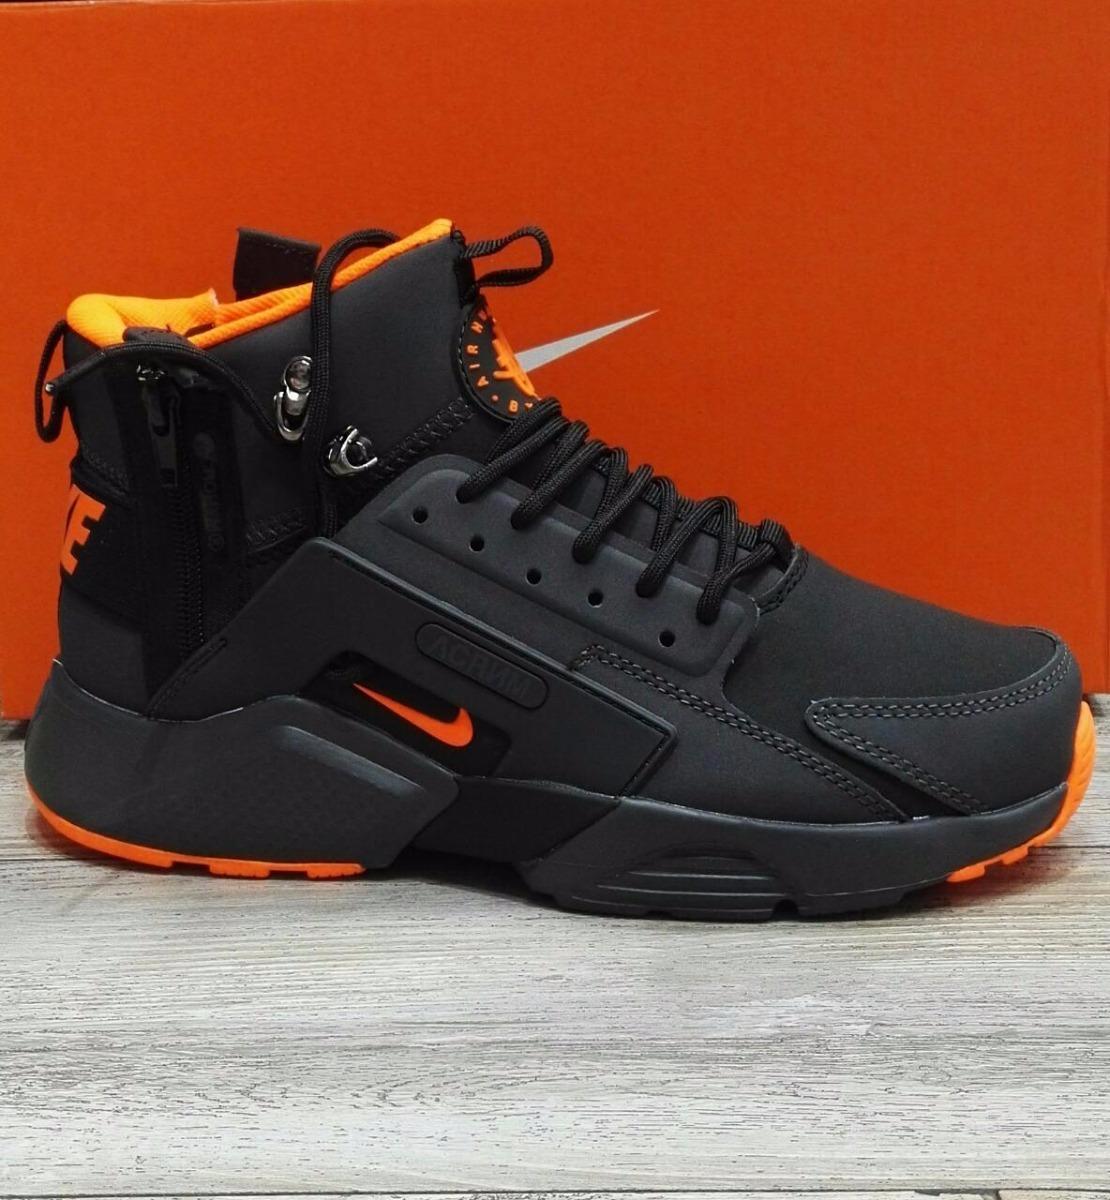 buy online 0d90b 49d0b De Zapatillas Hombre Huarache Botas En Nike Tenis 223 000 wq